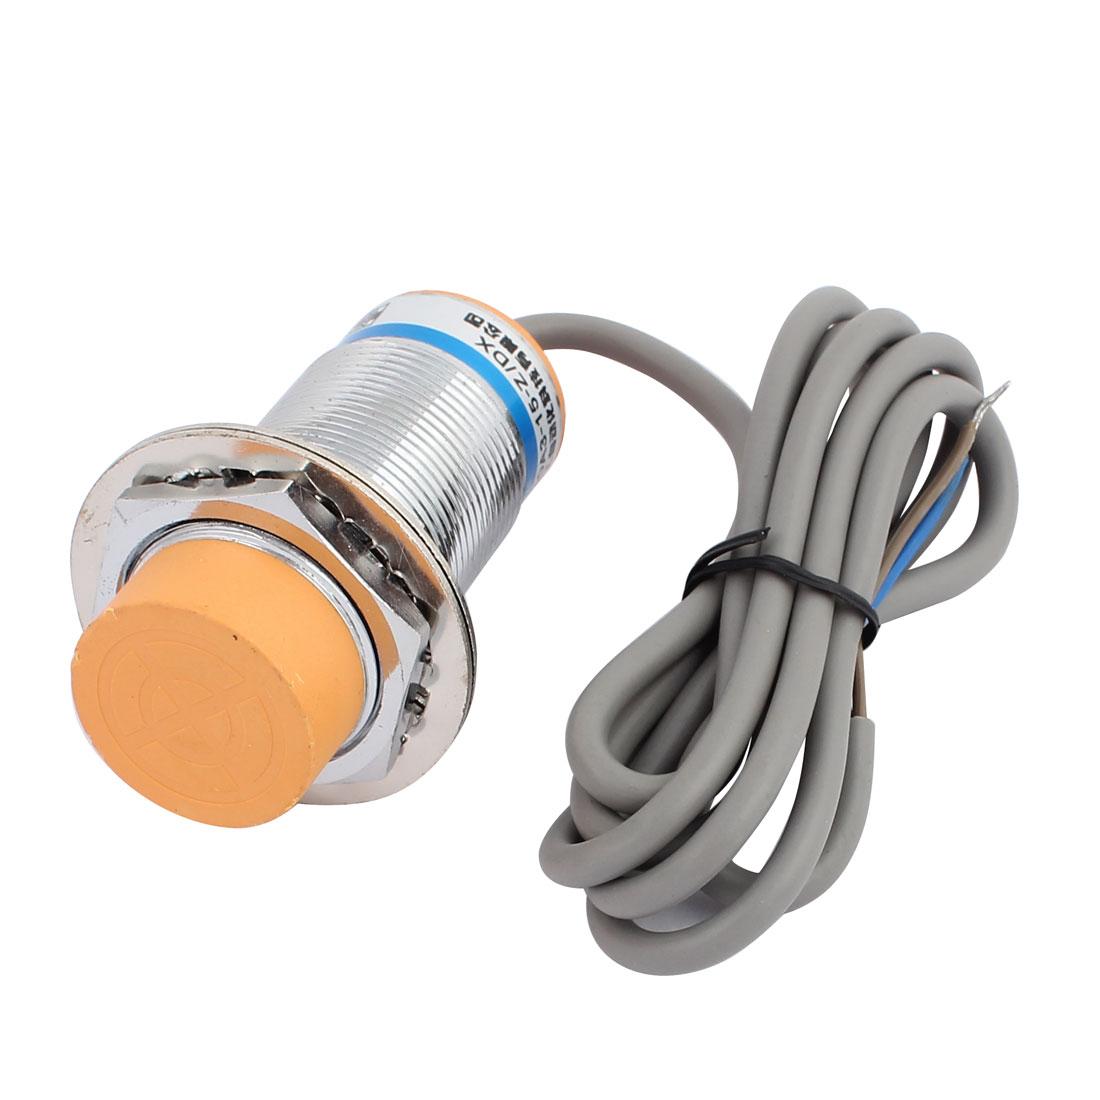 LJ30A3-15-Z/DX DC6-36V 200mA NPN NC 15mm Inductive Proximity Sensor Switch 2wire